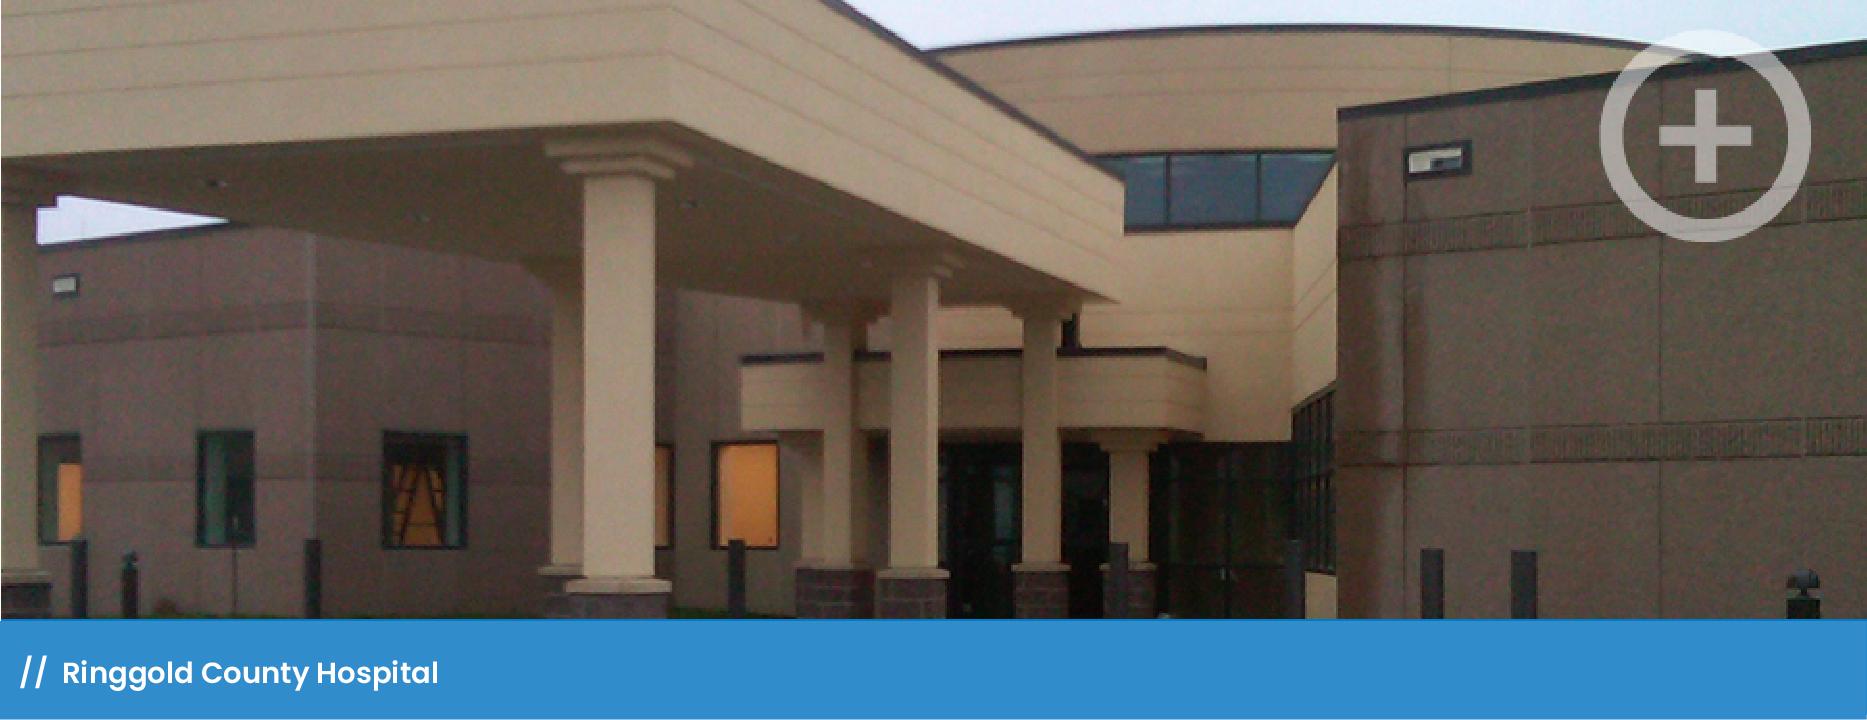 Yanik-Watermark_Ringgold County Hospital-